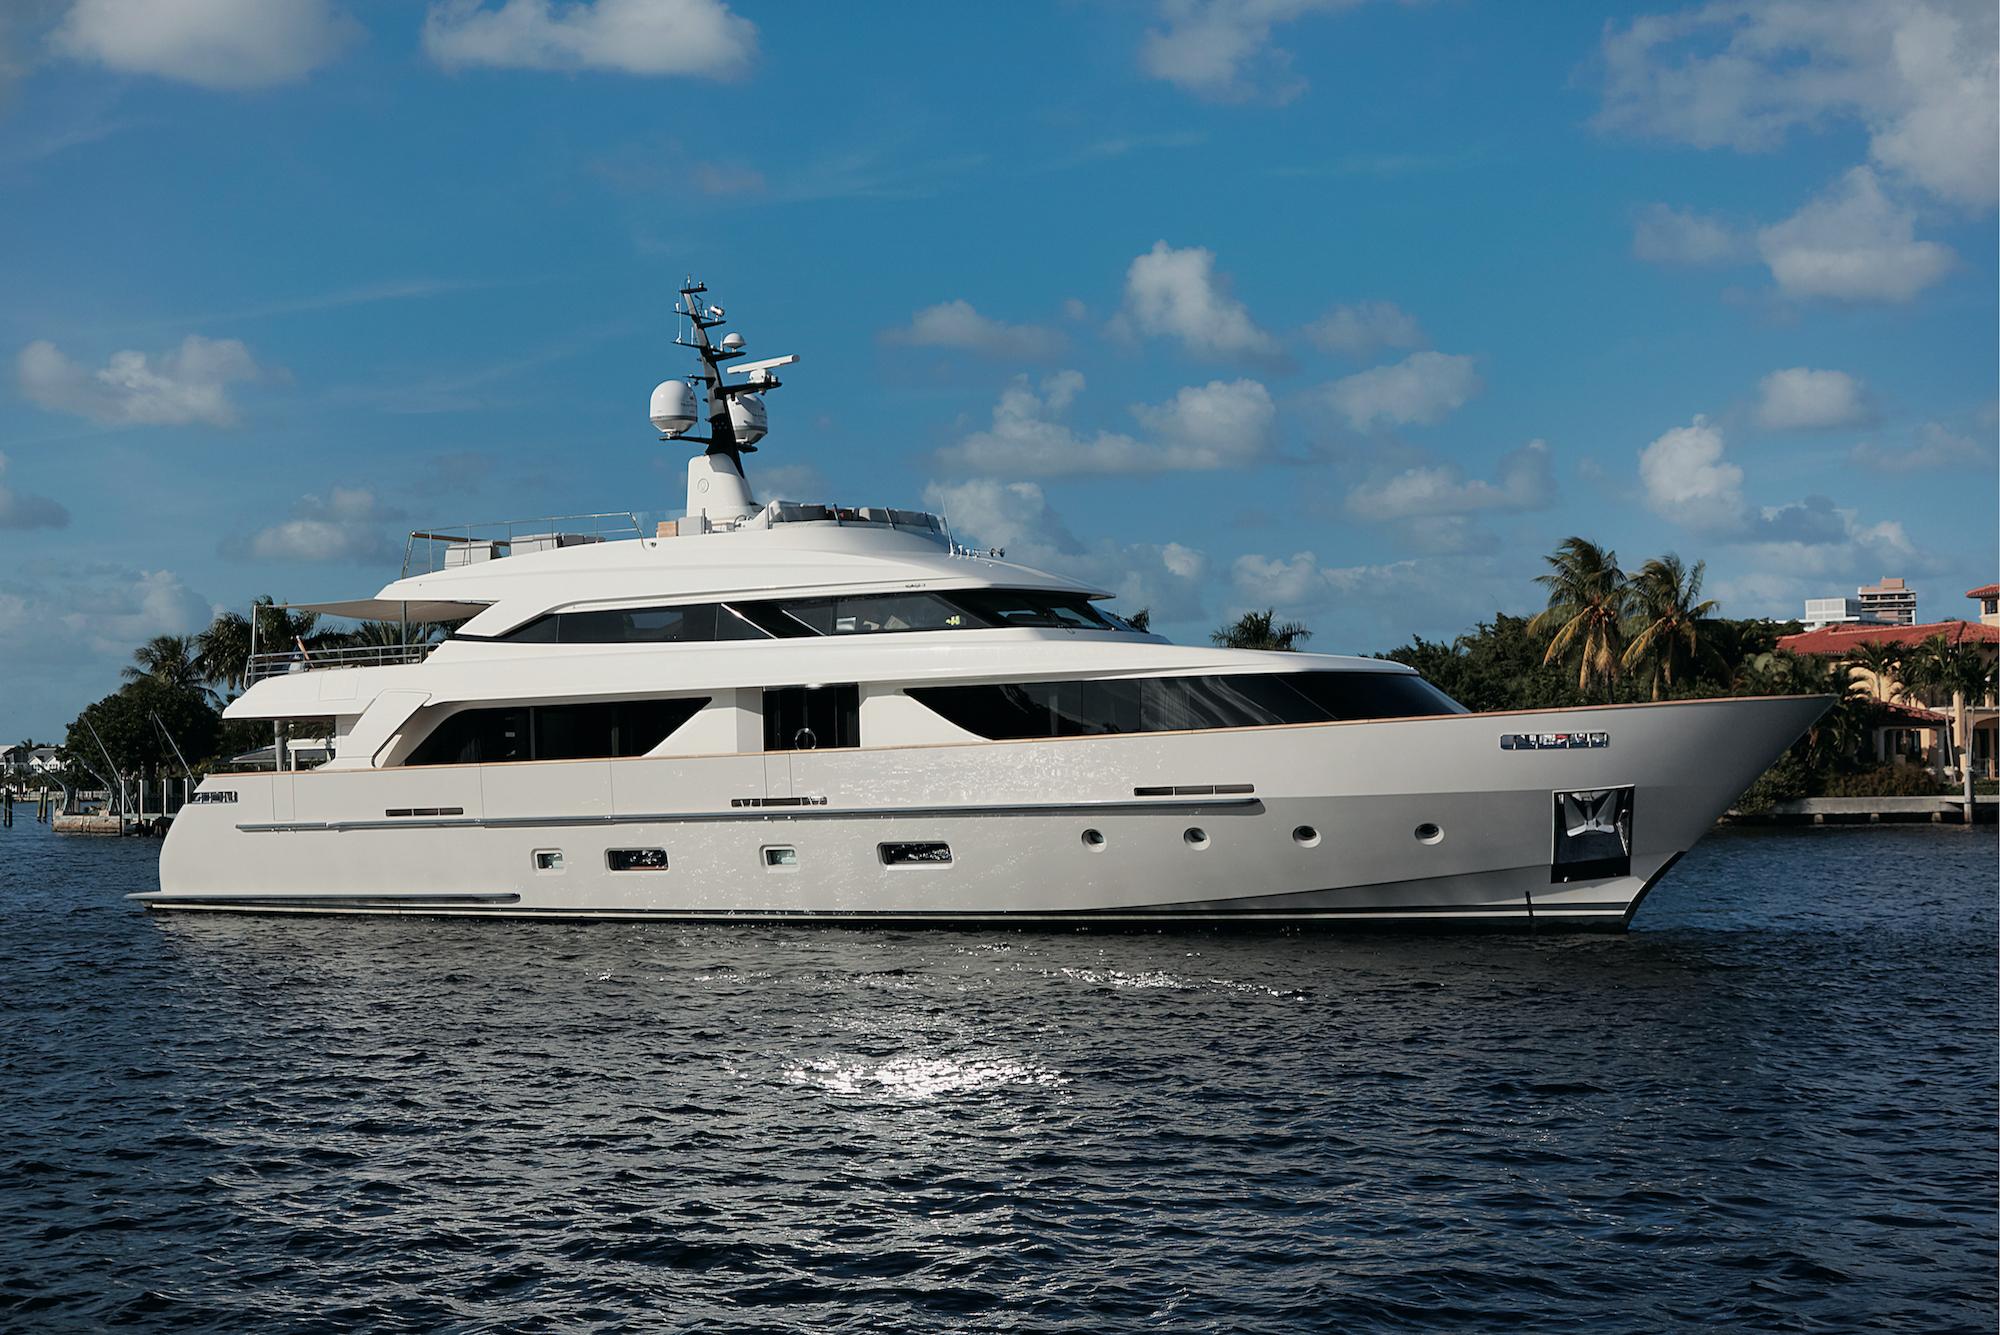 112 Sanlorenzo Sold By Yacht Broker David Johnson